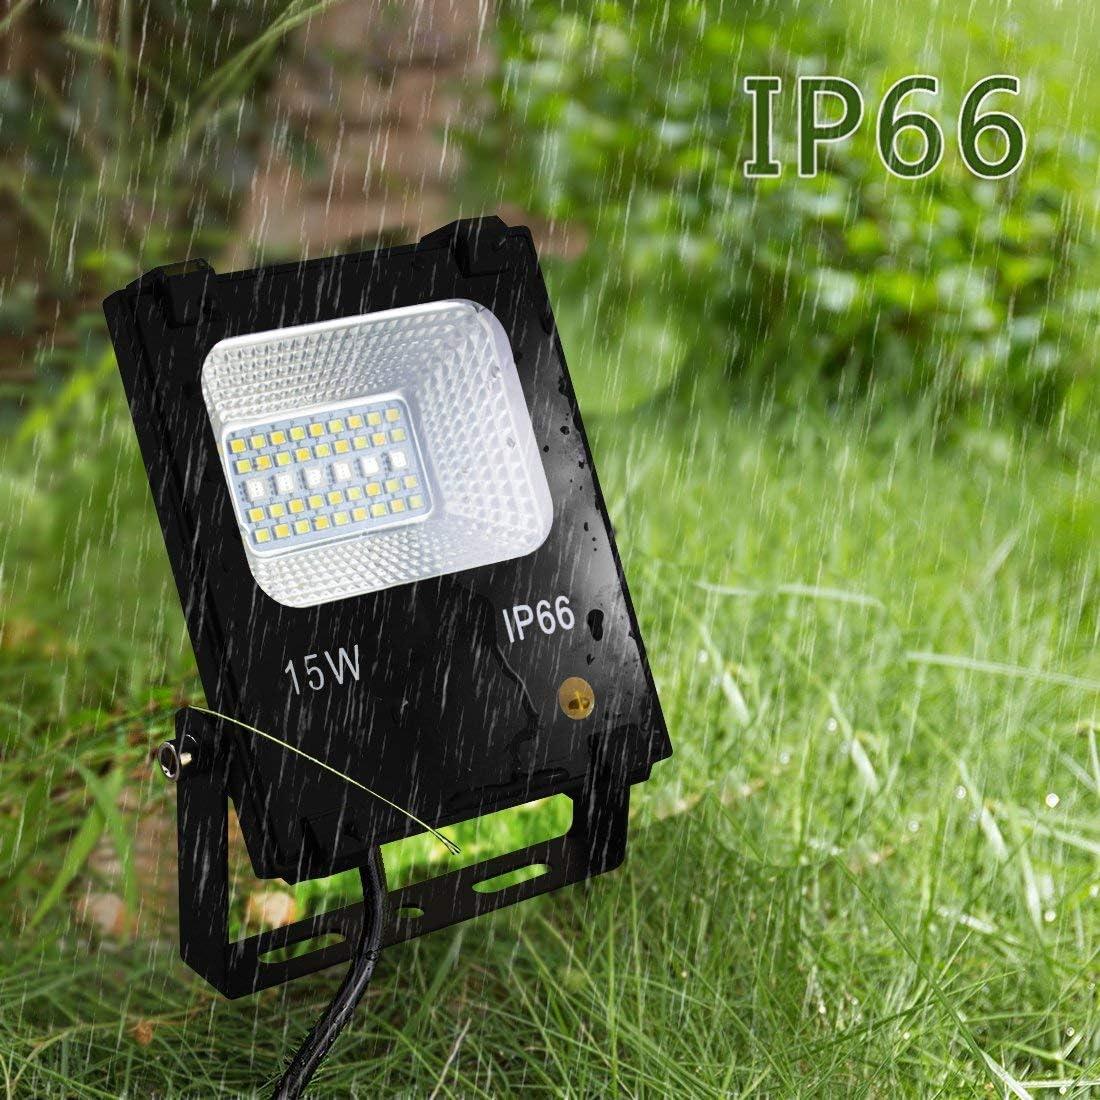 Dimmable LED Flood Light 2 Pack 15W Outdoor RGB Color Changing Led Stage Lights with Remote 100W Equivalent Landscape Lighting IP66,US 3-Plug 120 Colors,RGBW 2700K-5700K Adjustable DIY Flash Mode